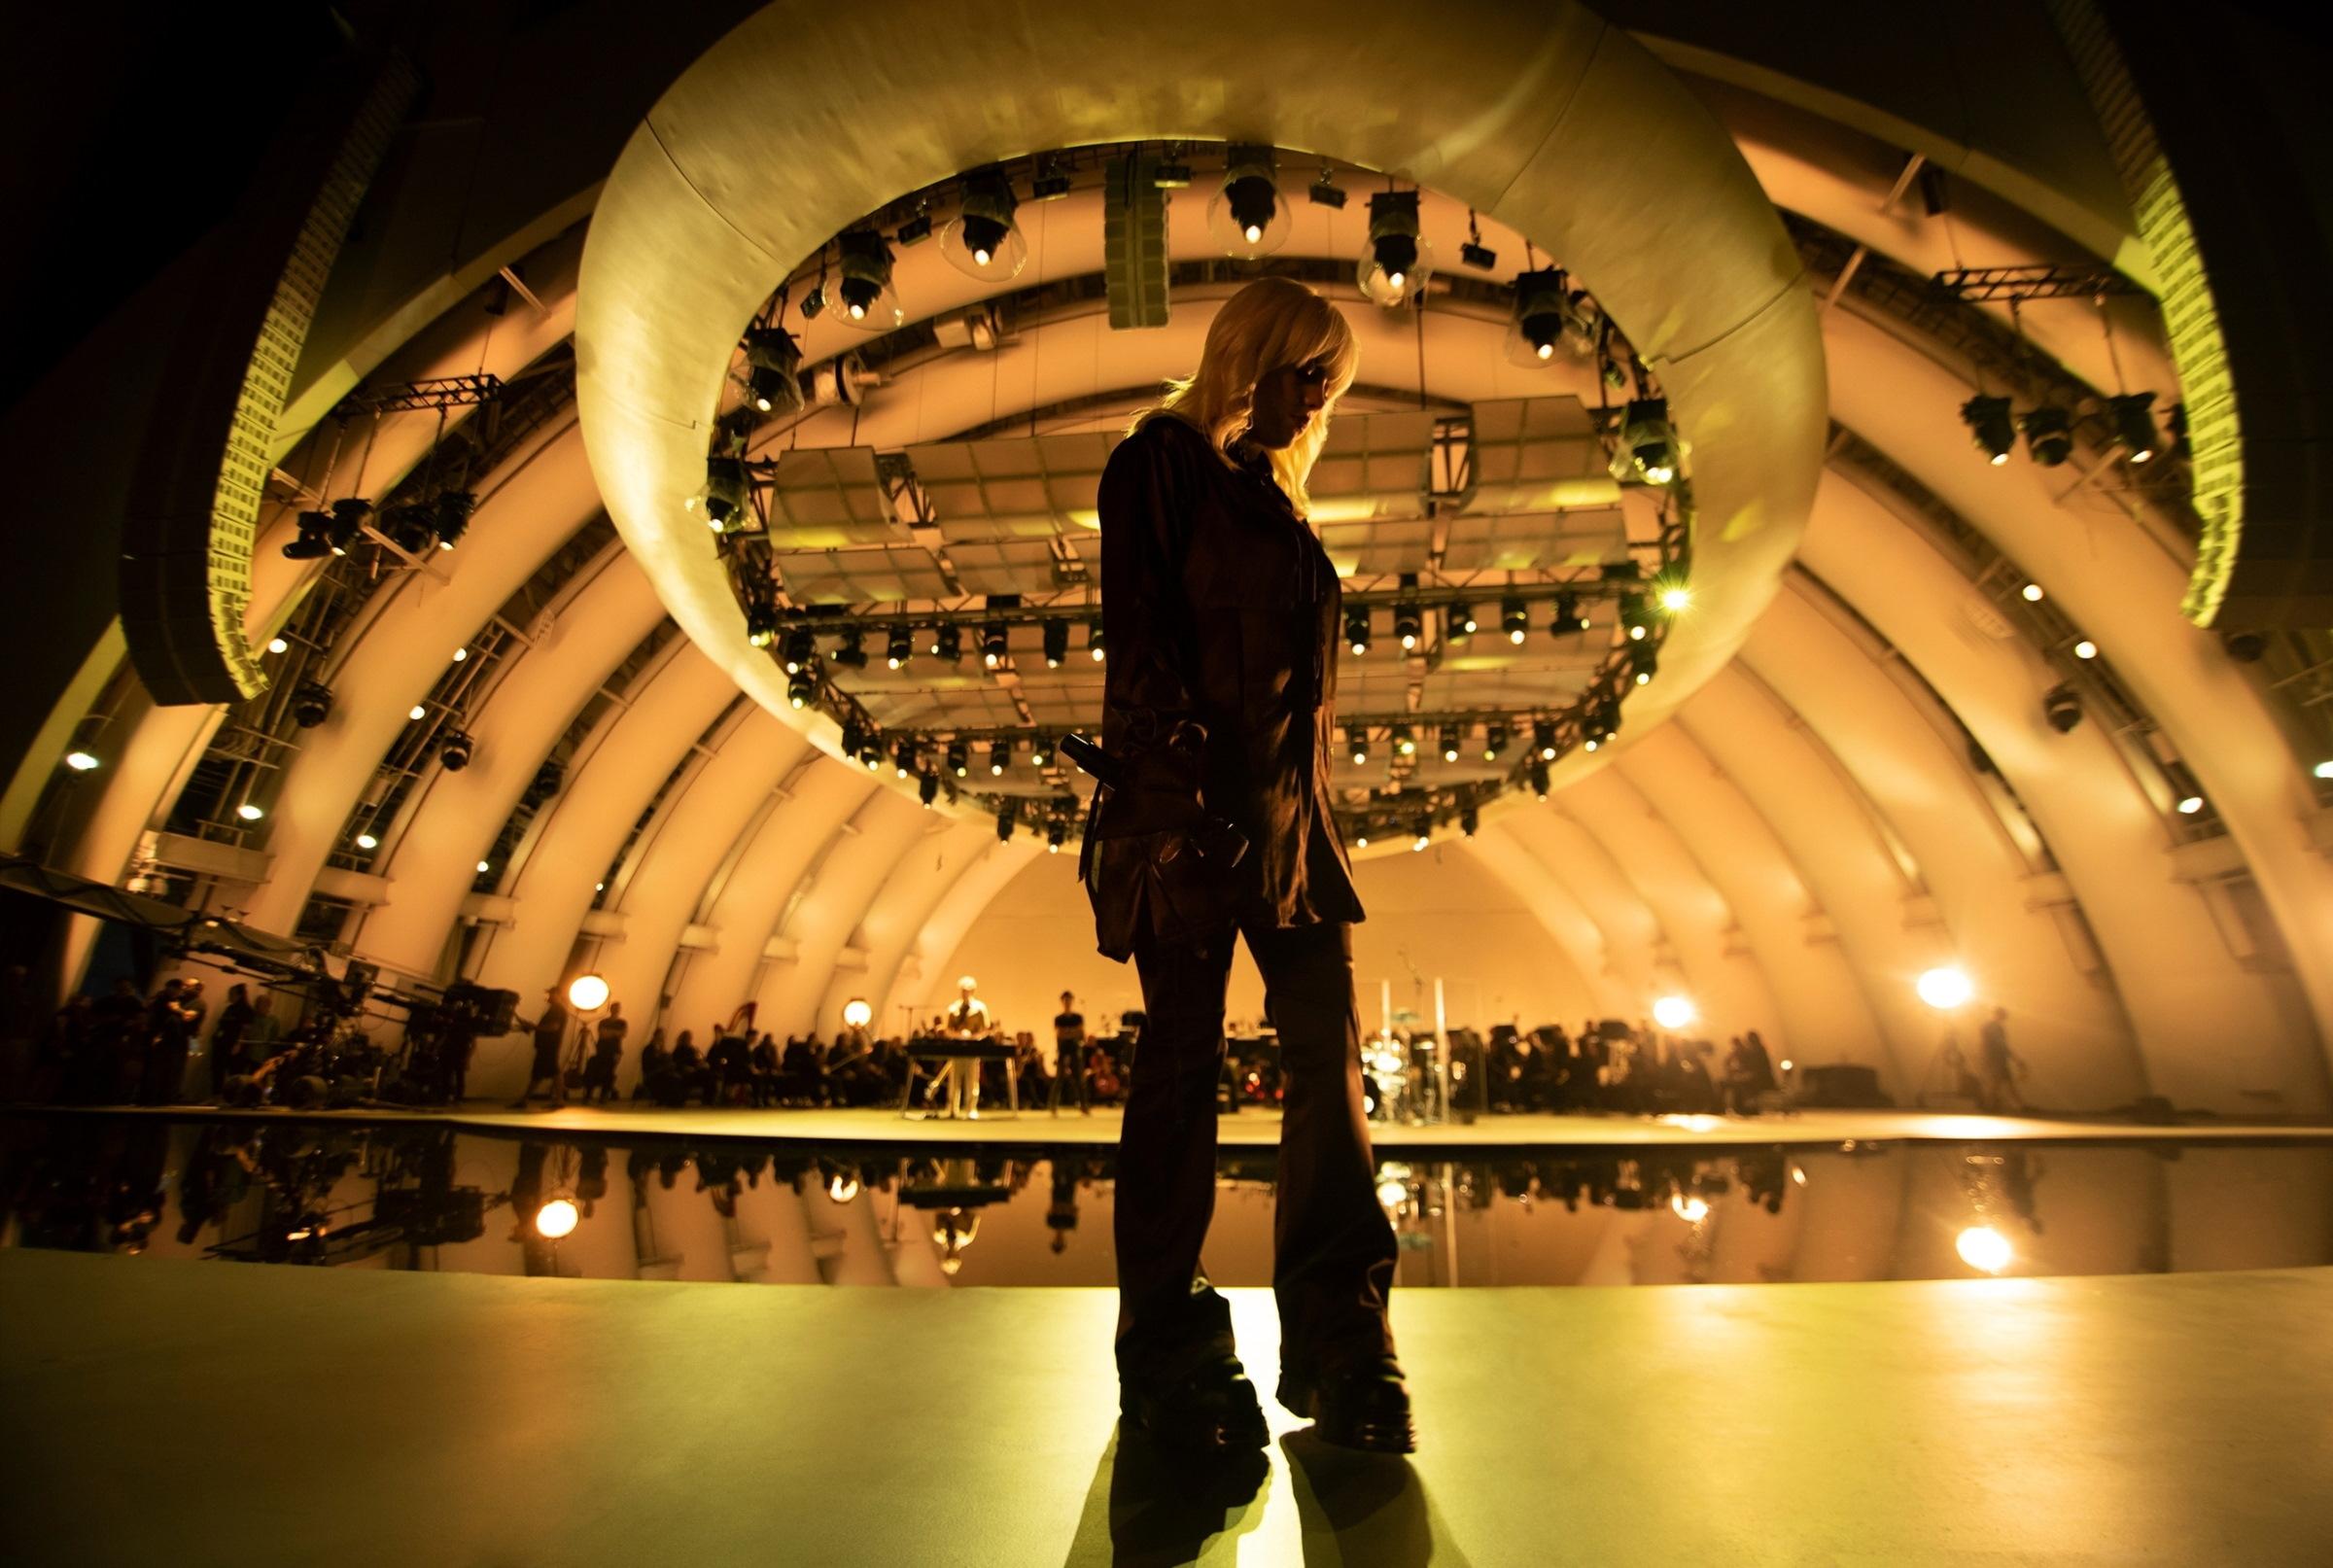 Disney+ Reveals Details Behind Its Billie Eilish Cinematic Concert Experience Special